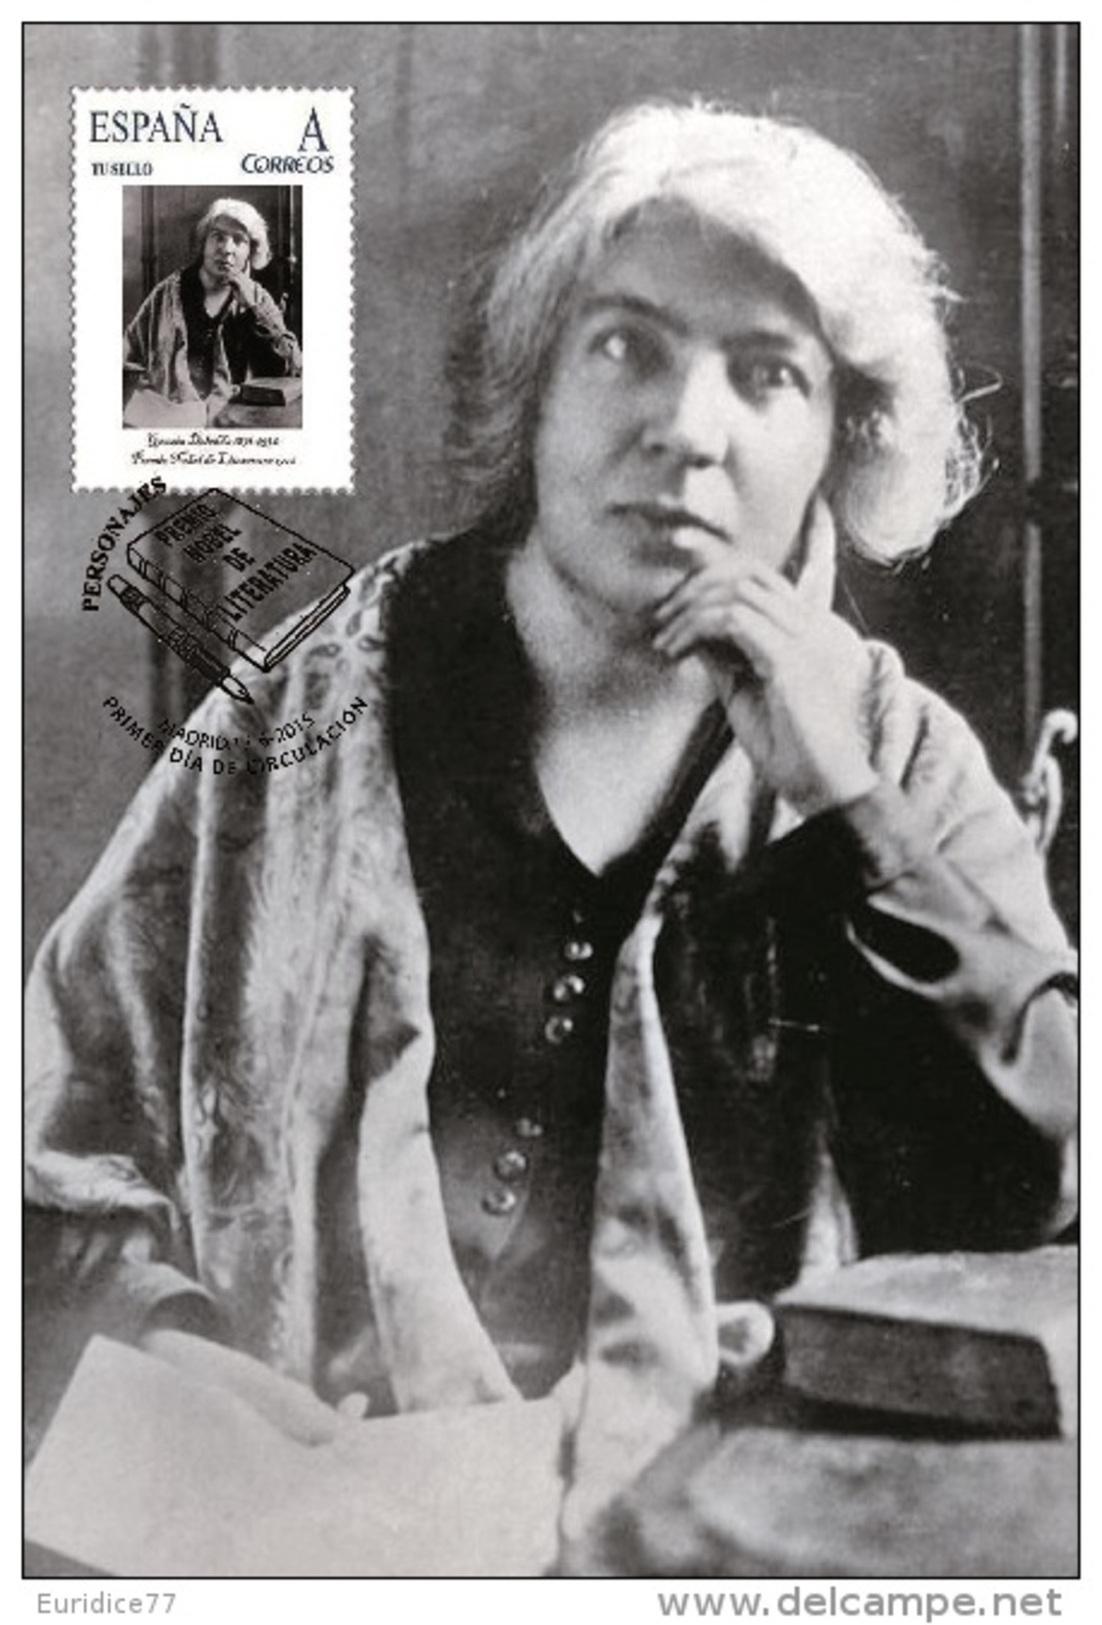 Spain 2015 - Nobel Prize 1926 - Literature - Grazia Deledda/Italy Maxicard - Prix Nobel